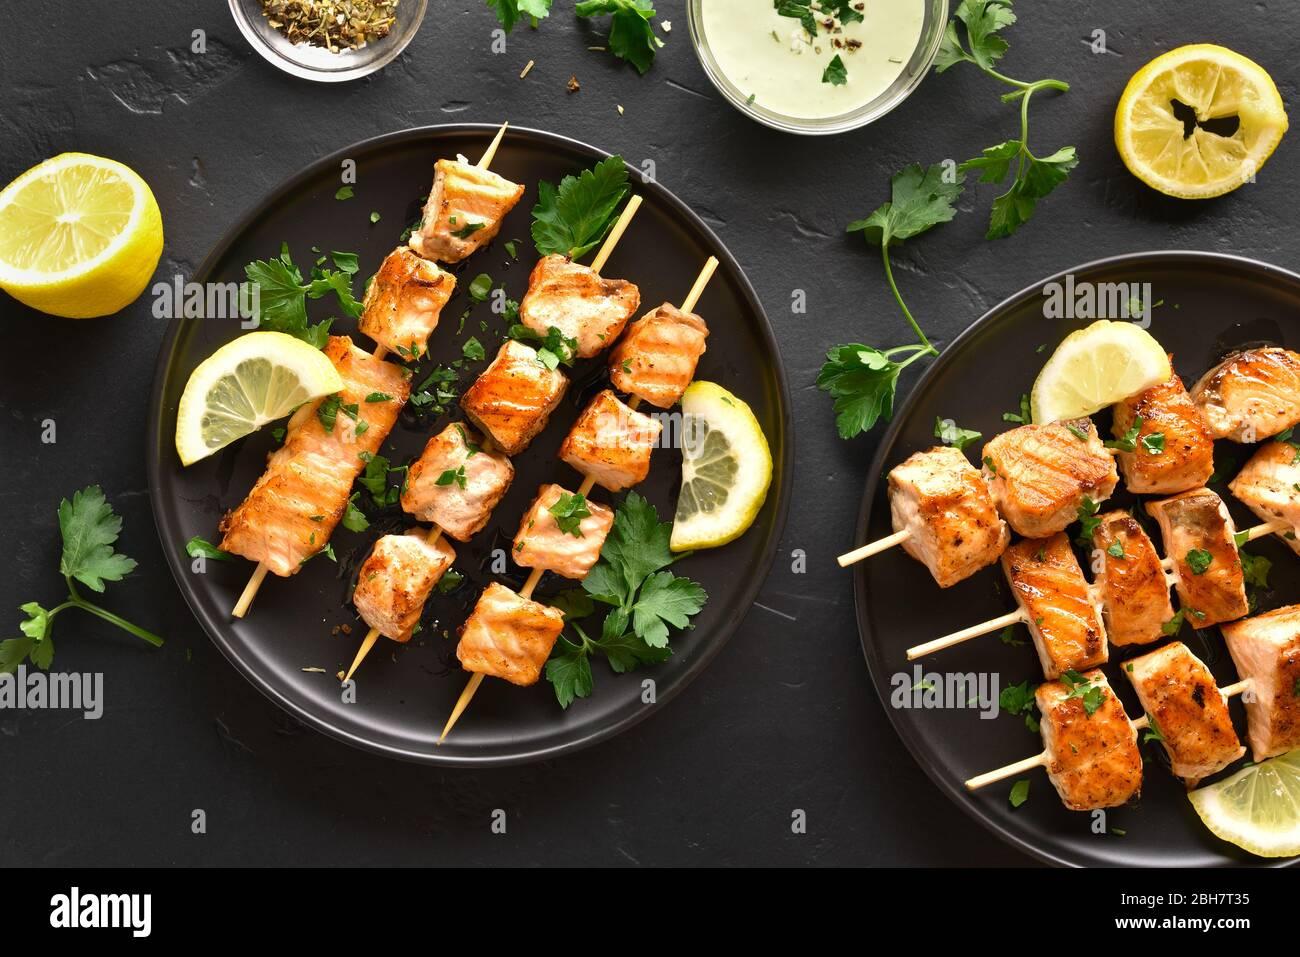 Salmón grillado kebab. Barbacoa pinchos de salmón sobre fondo de piedra negra. Vista superior, laicos plana Foto de stock